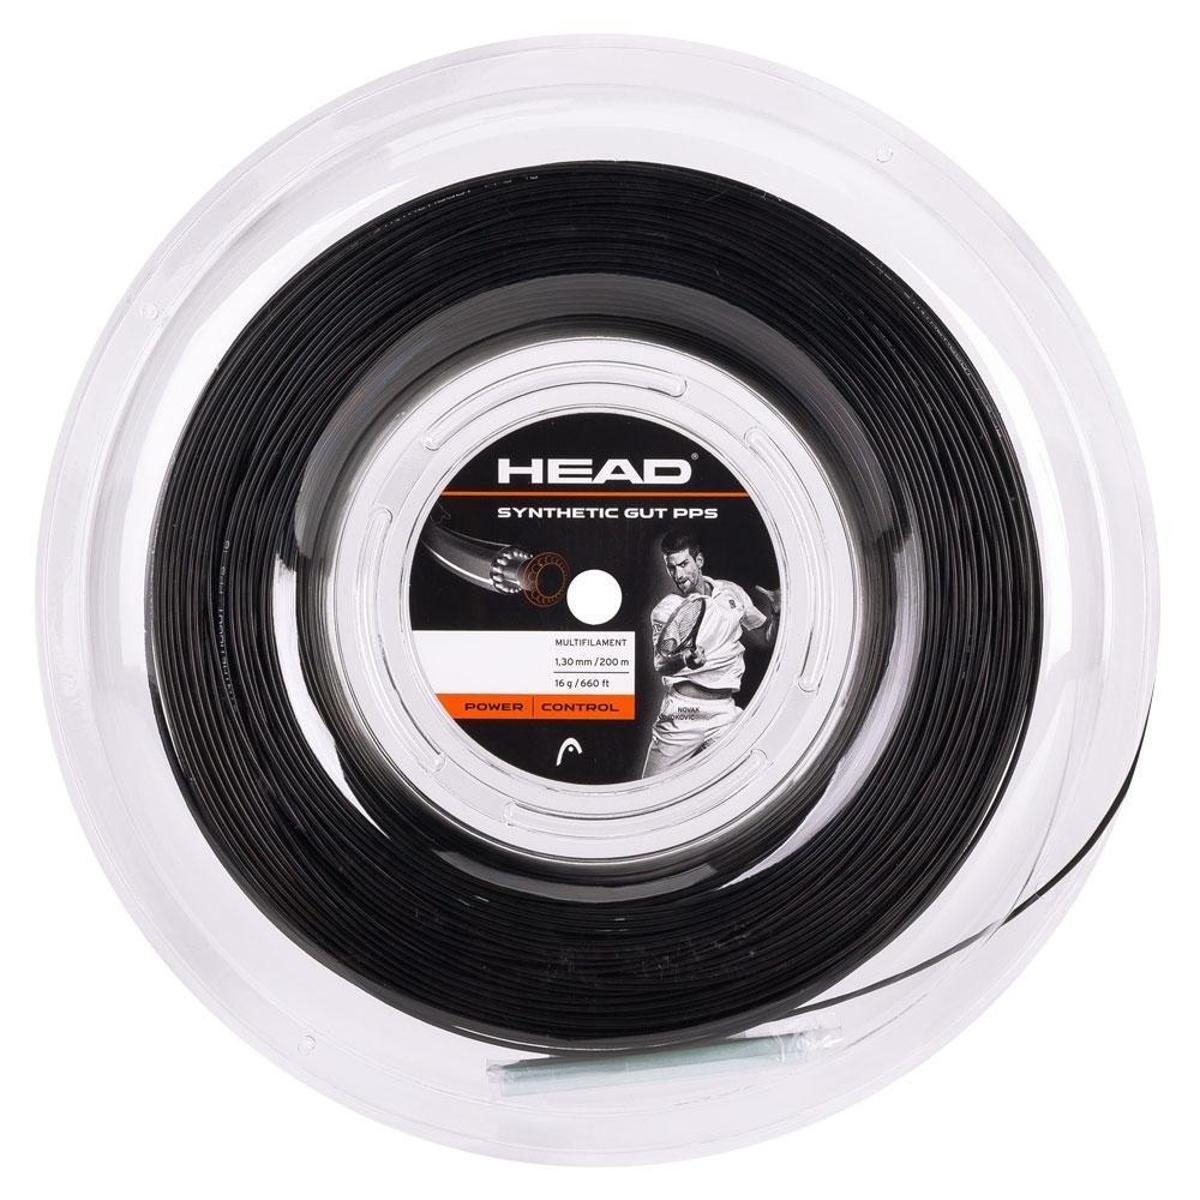 Corda de Tenis Head Synthetic GUT PPS 1.30MM Preta Rolo com 200M